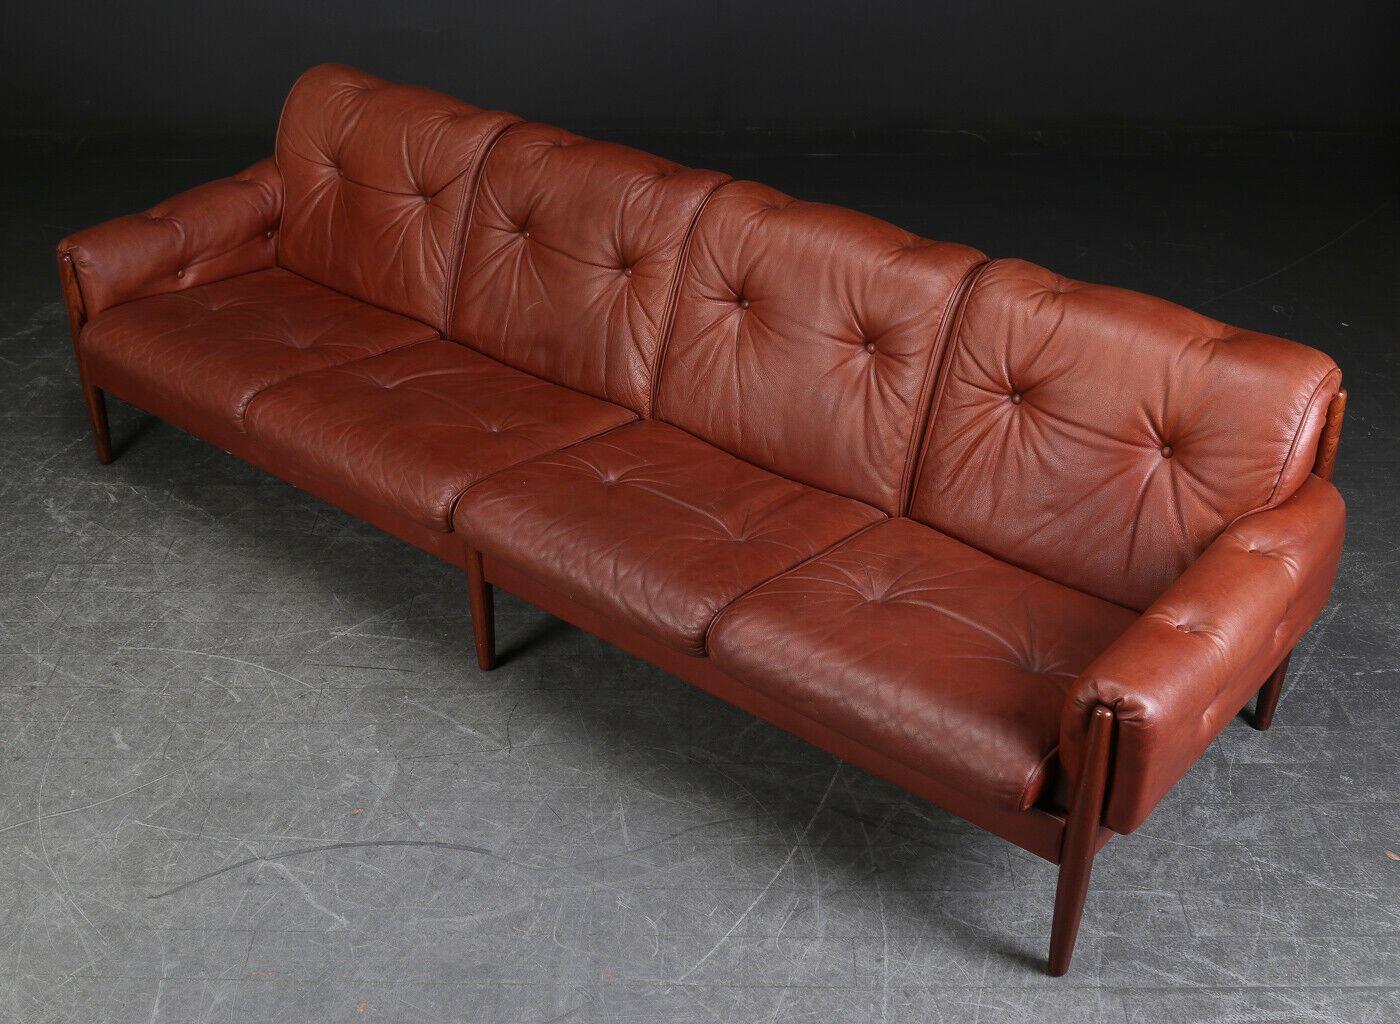 Vintage Retro Danish 4 Seater Cognac Sofa 1960 S Retro Sofa Vintage Sofa Brown Leather Sofa